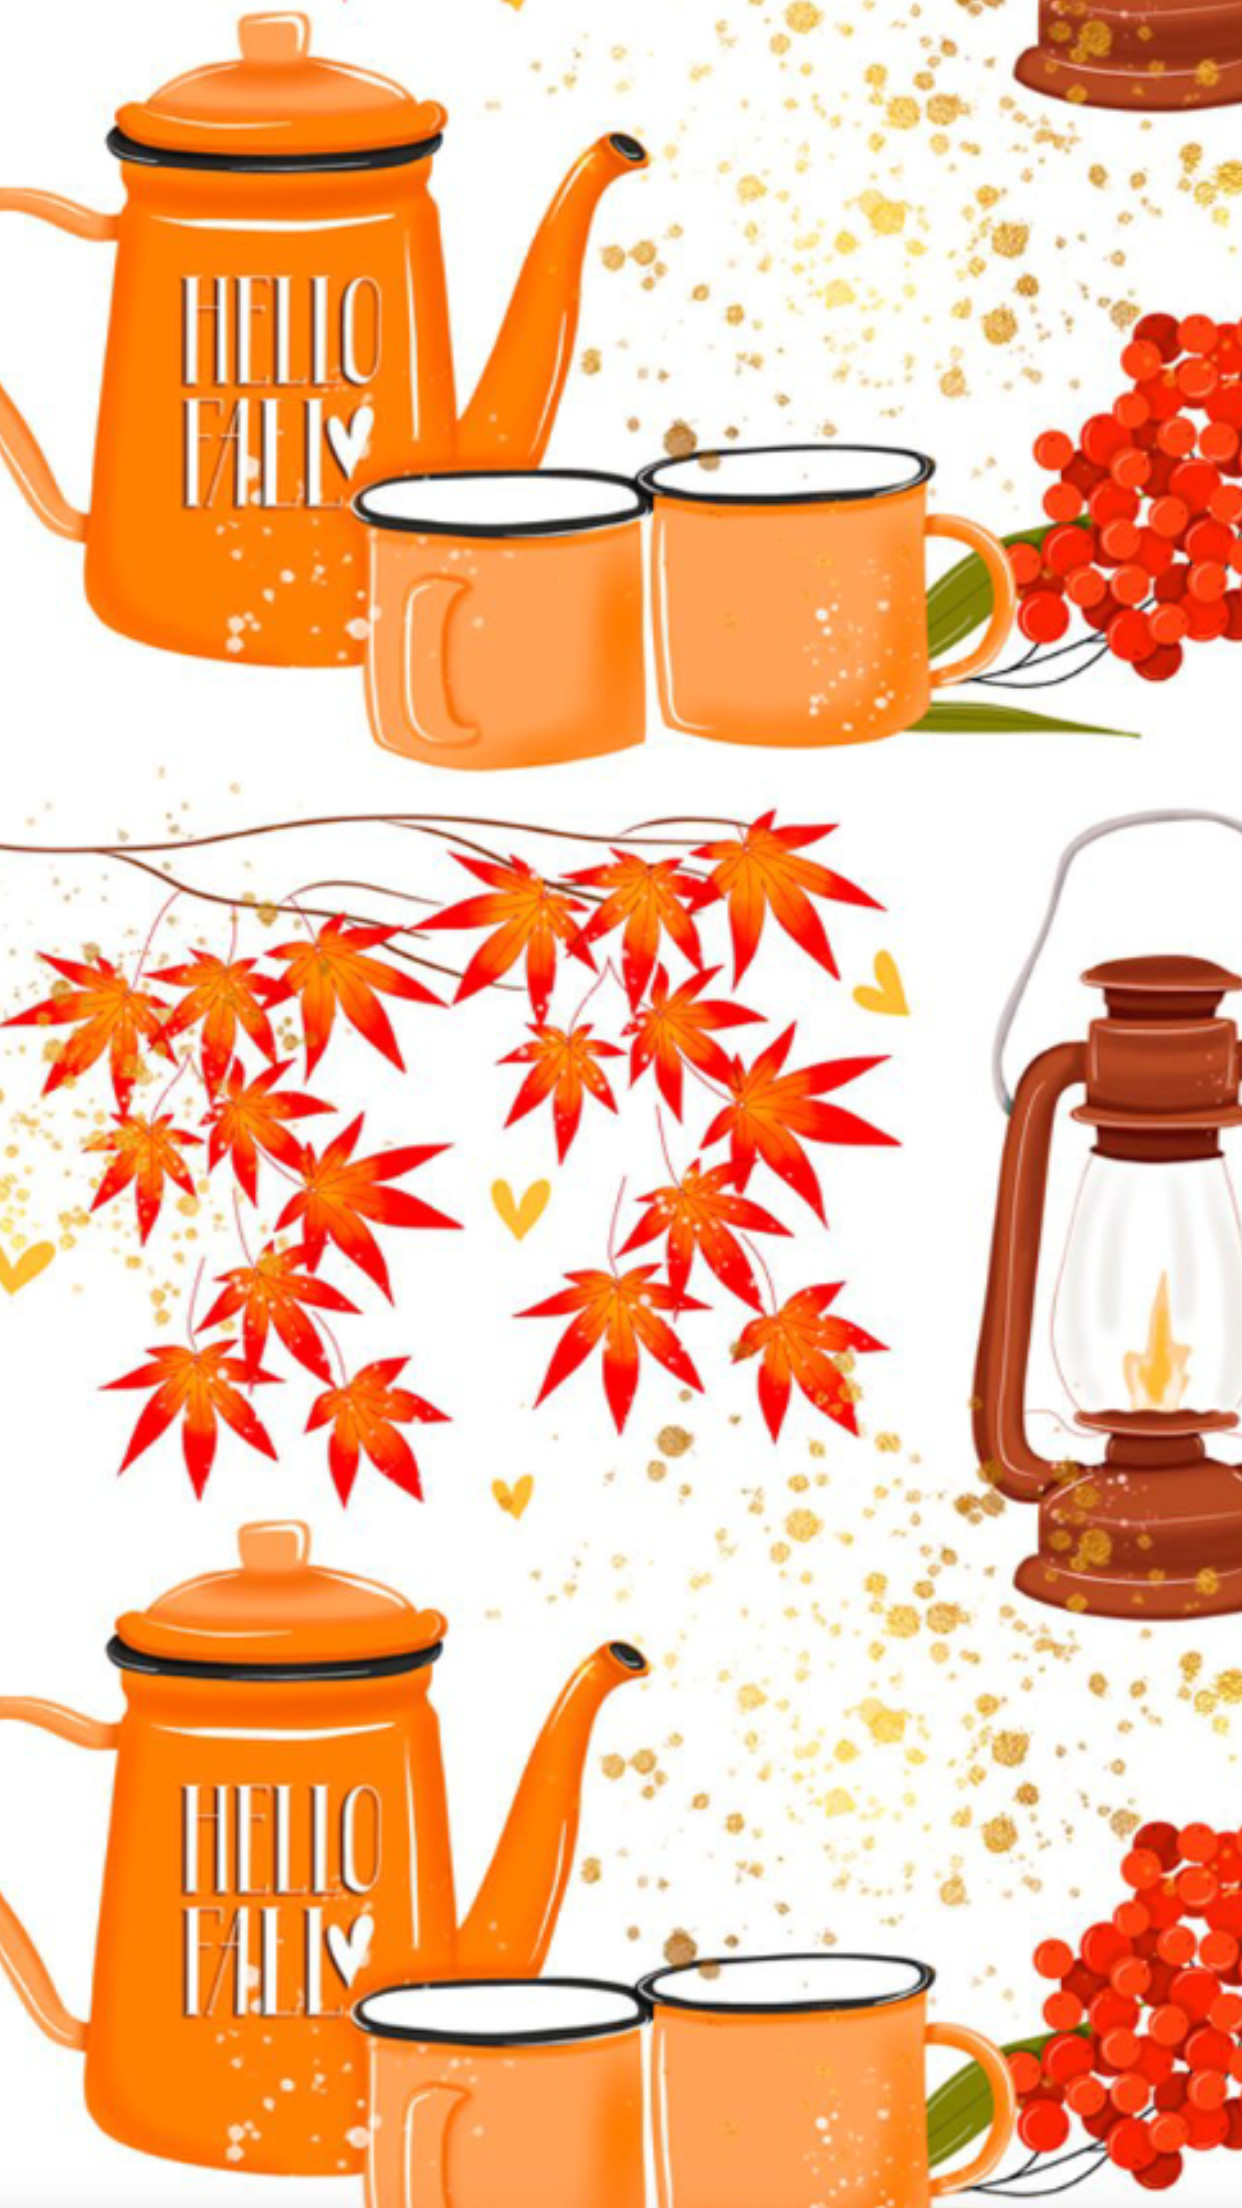 Hello Kitty Tapete, Tagebuch Karten, Iphone Hintergrundbild, - Thanksgiving Wallpapers For Iphone - HD Wallpaper